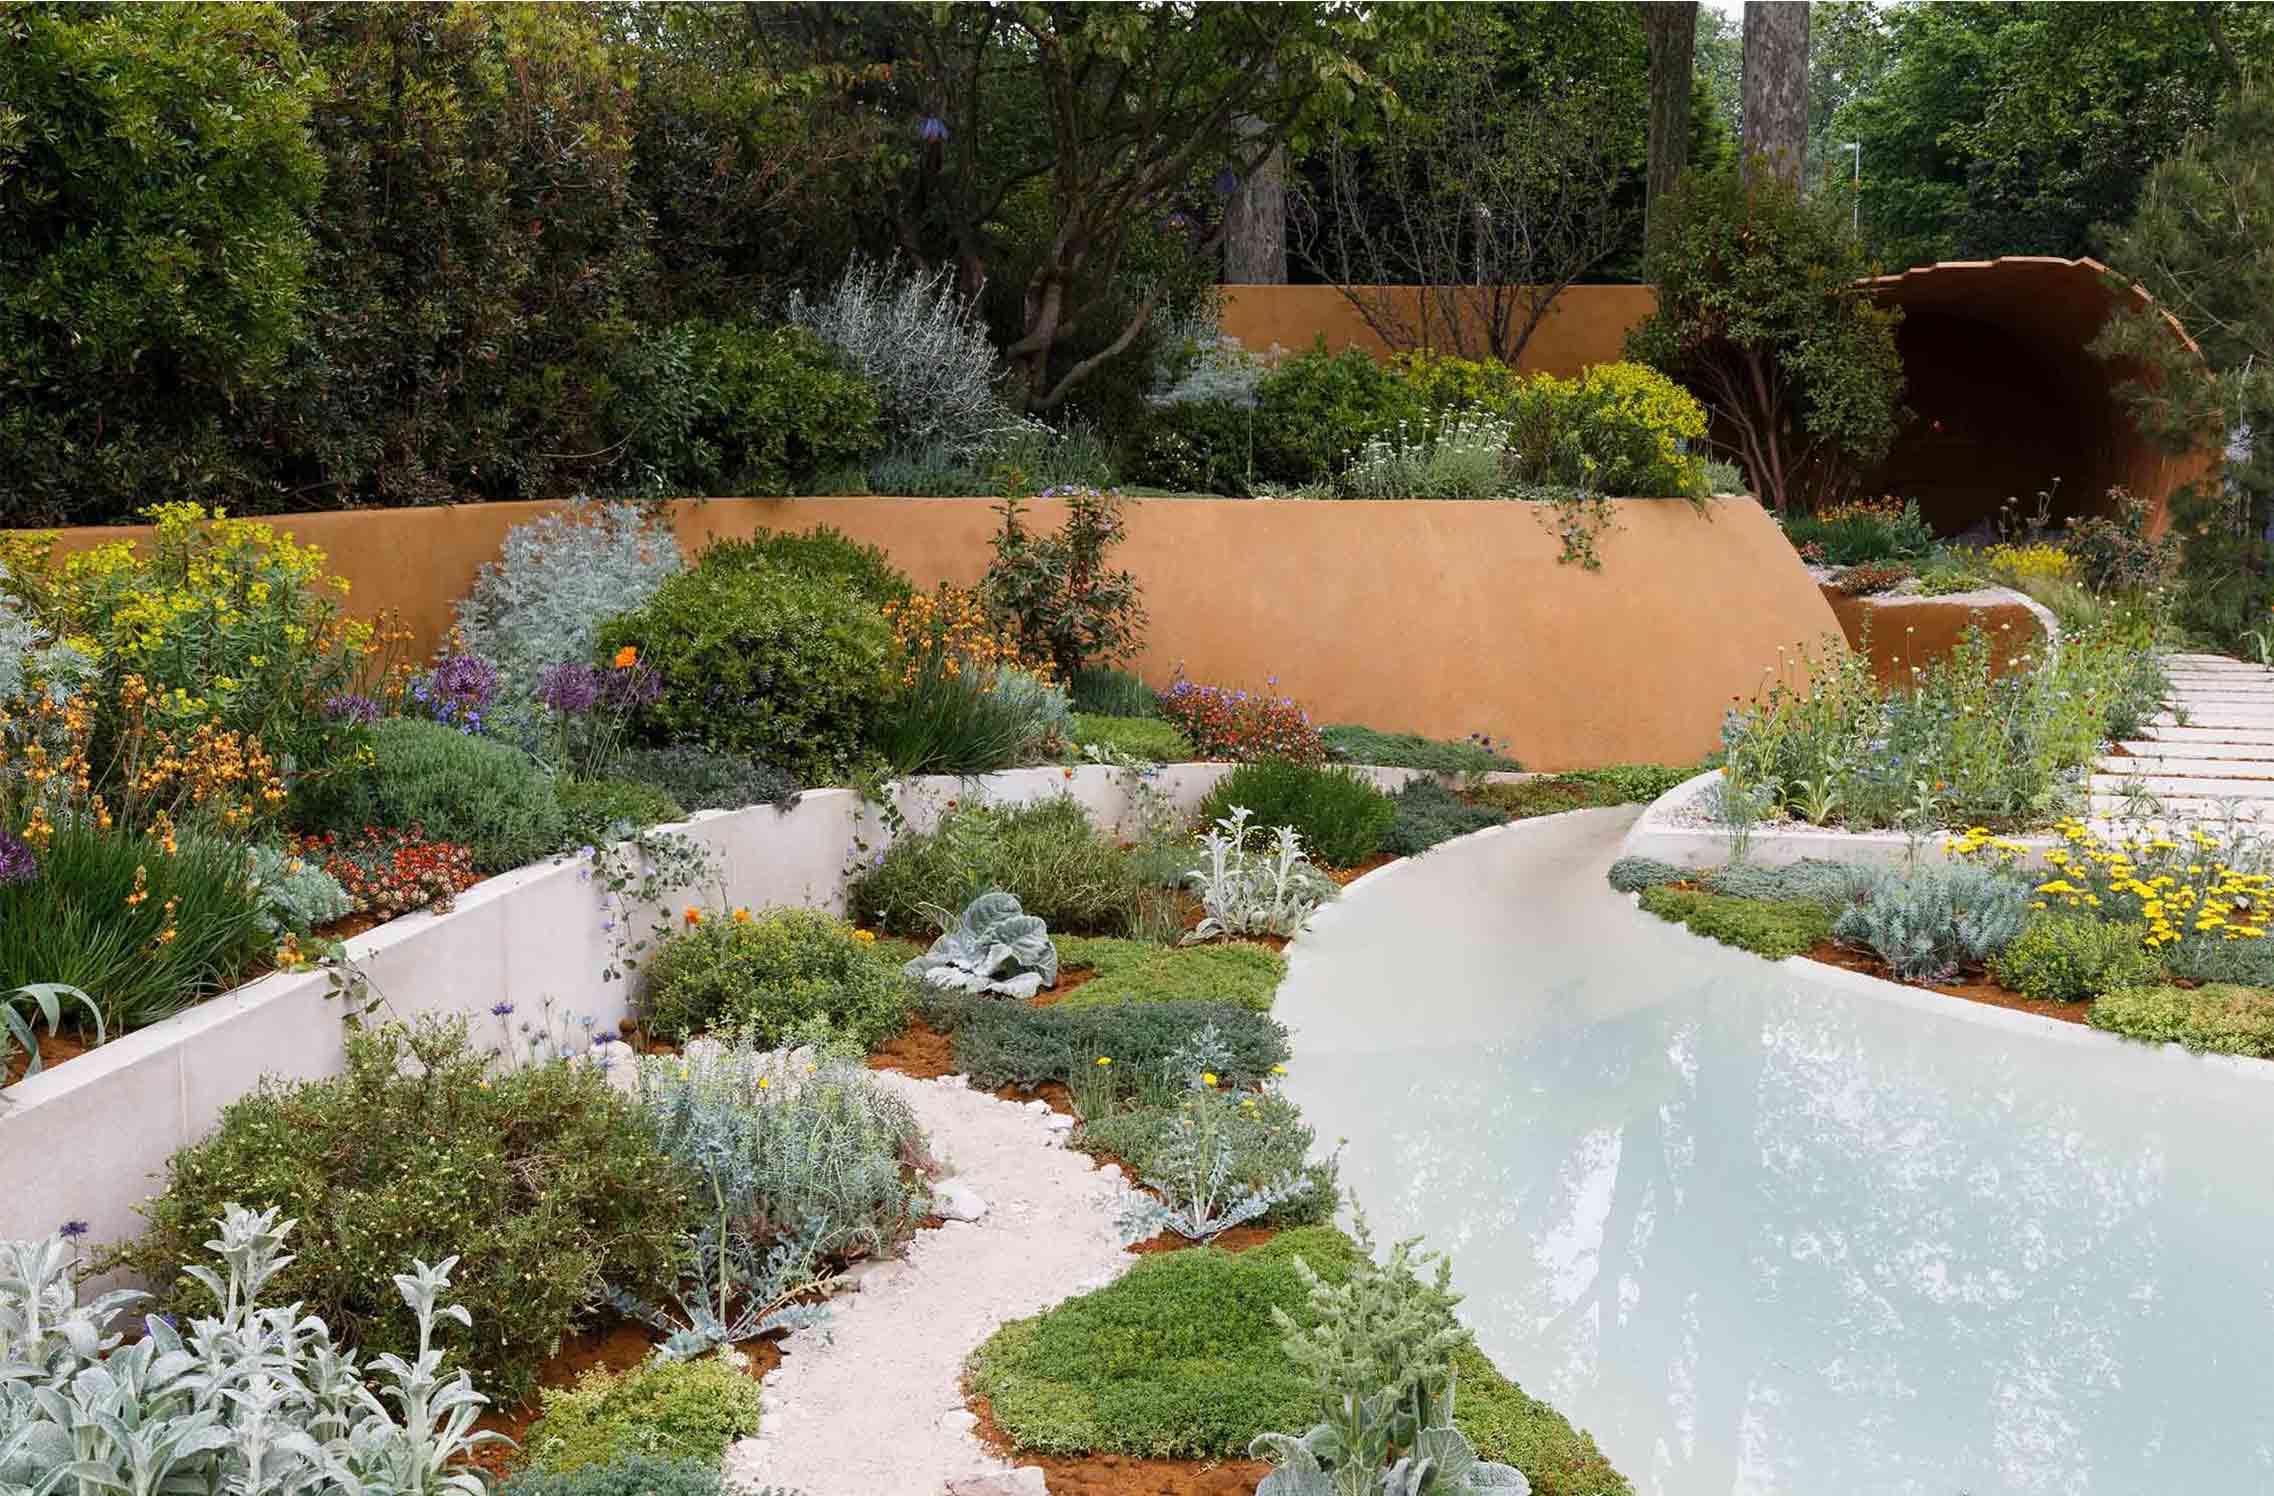 The Dubai Majlis Gardens, 2019